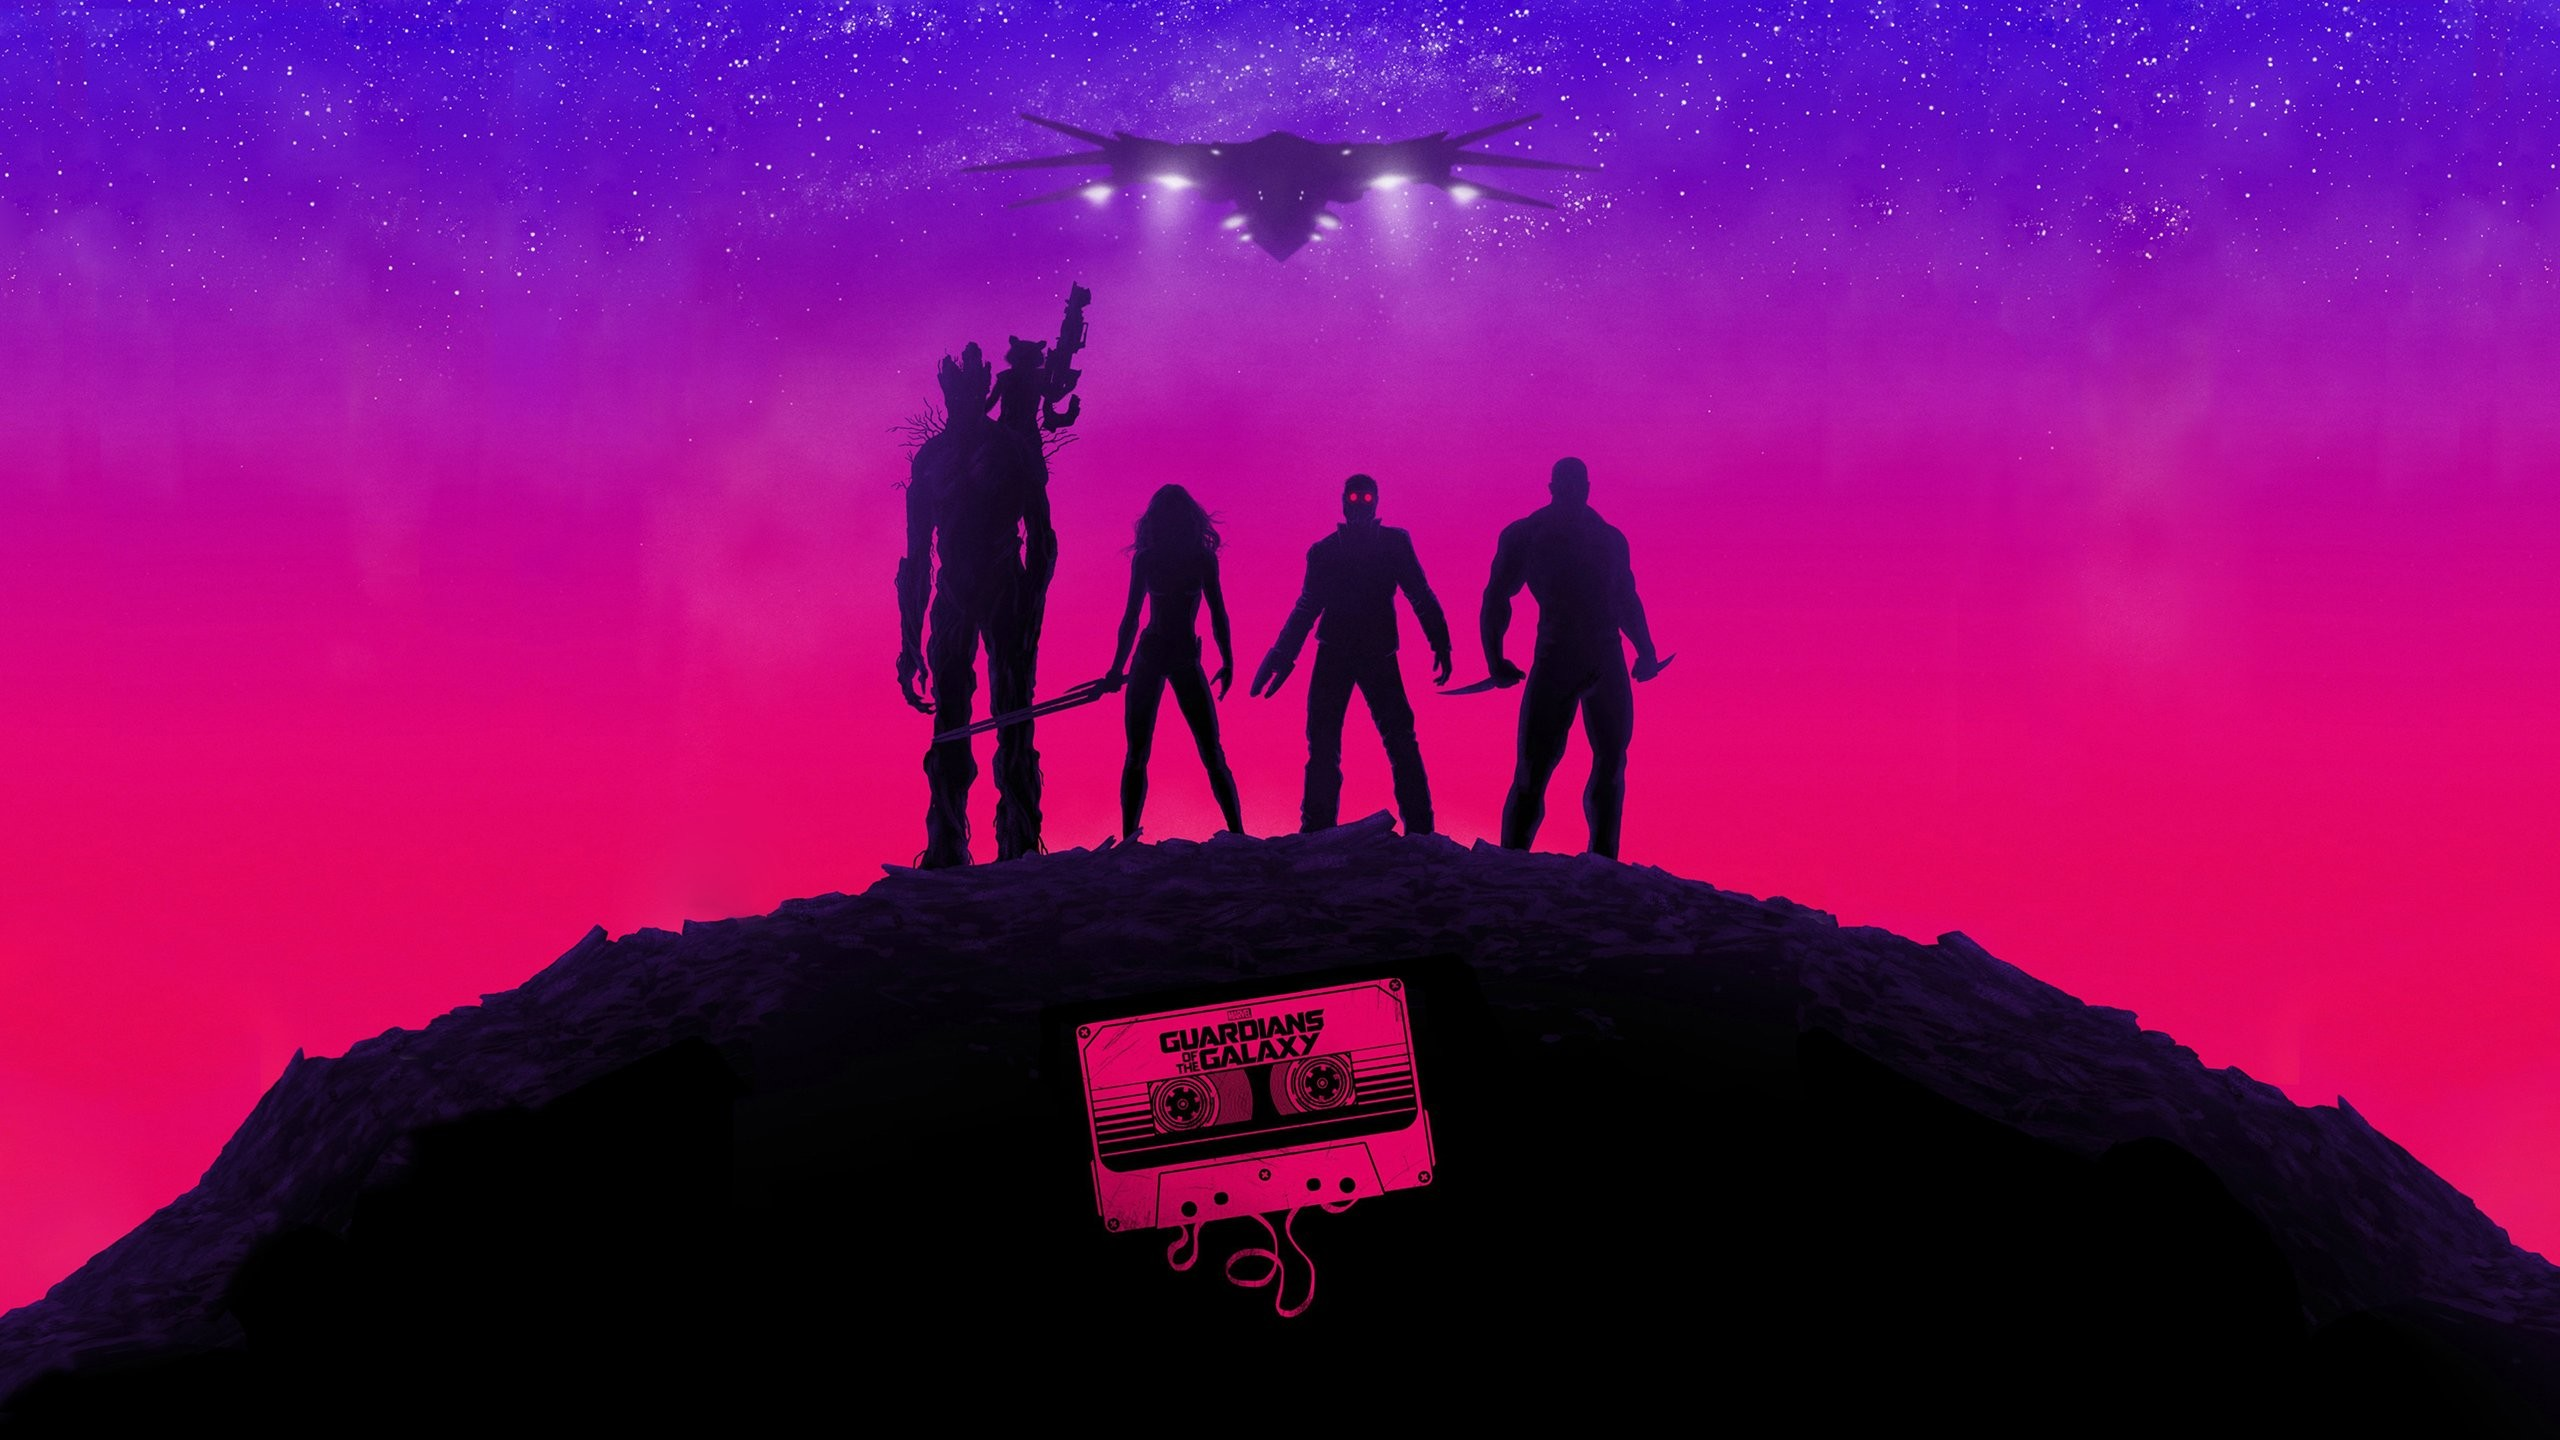 Guardians of the GalaxyMarvel Stars Purple Pink Cassette Tape Spaceship  wallpaper